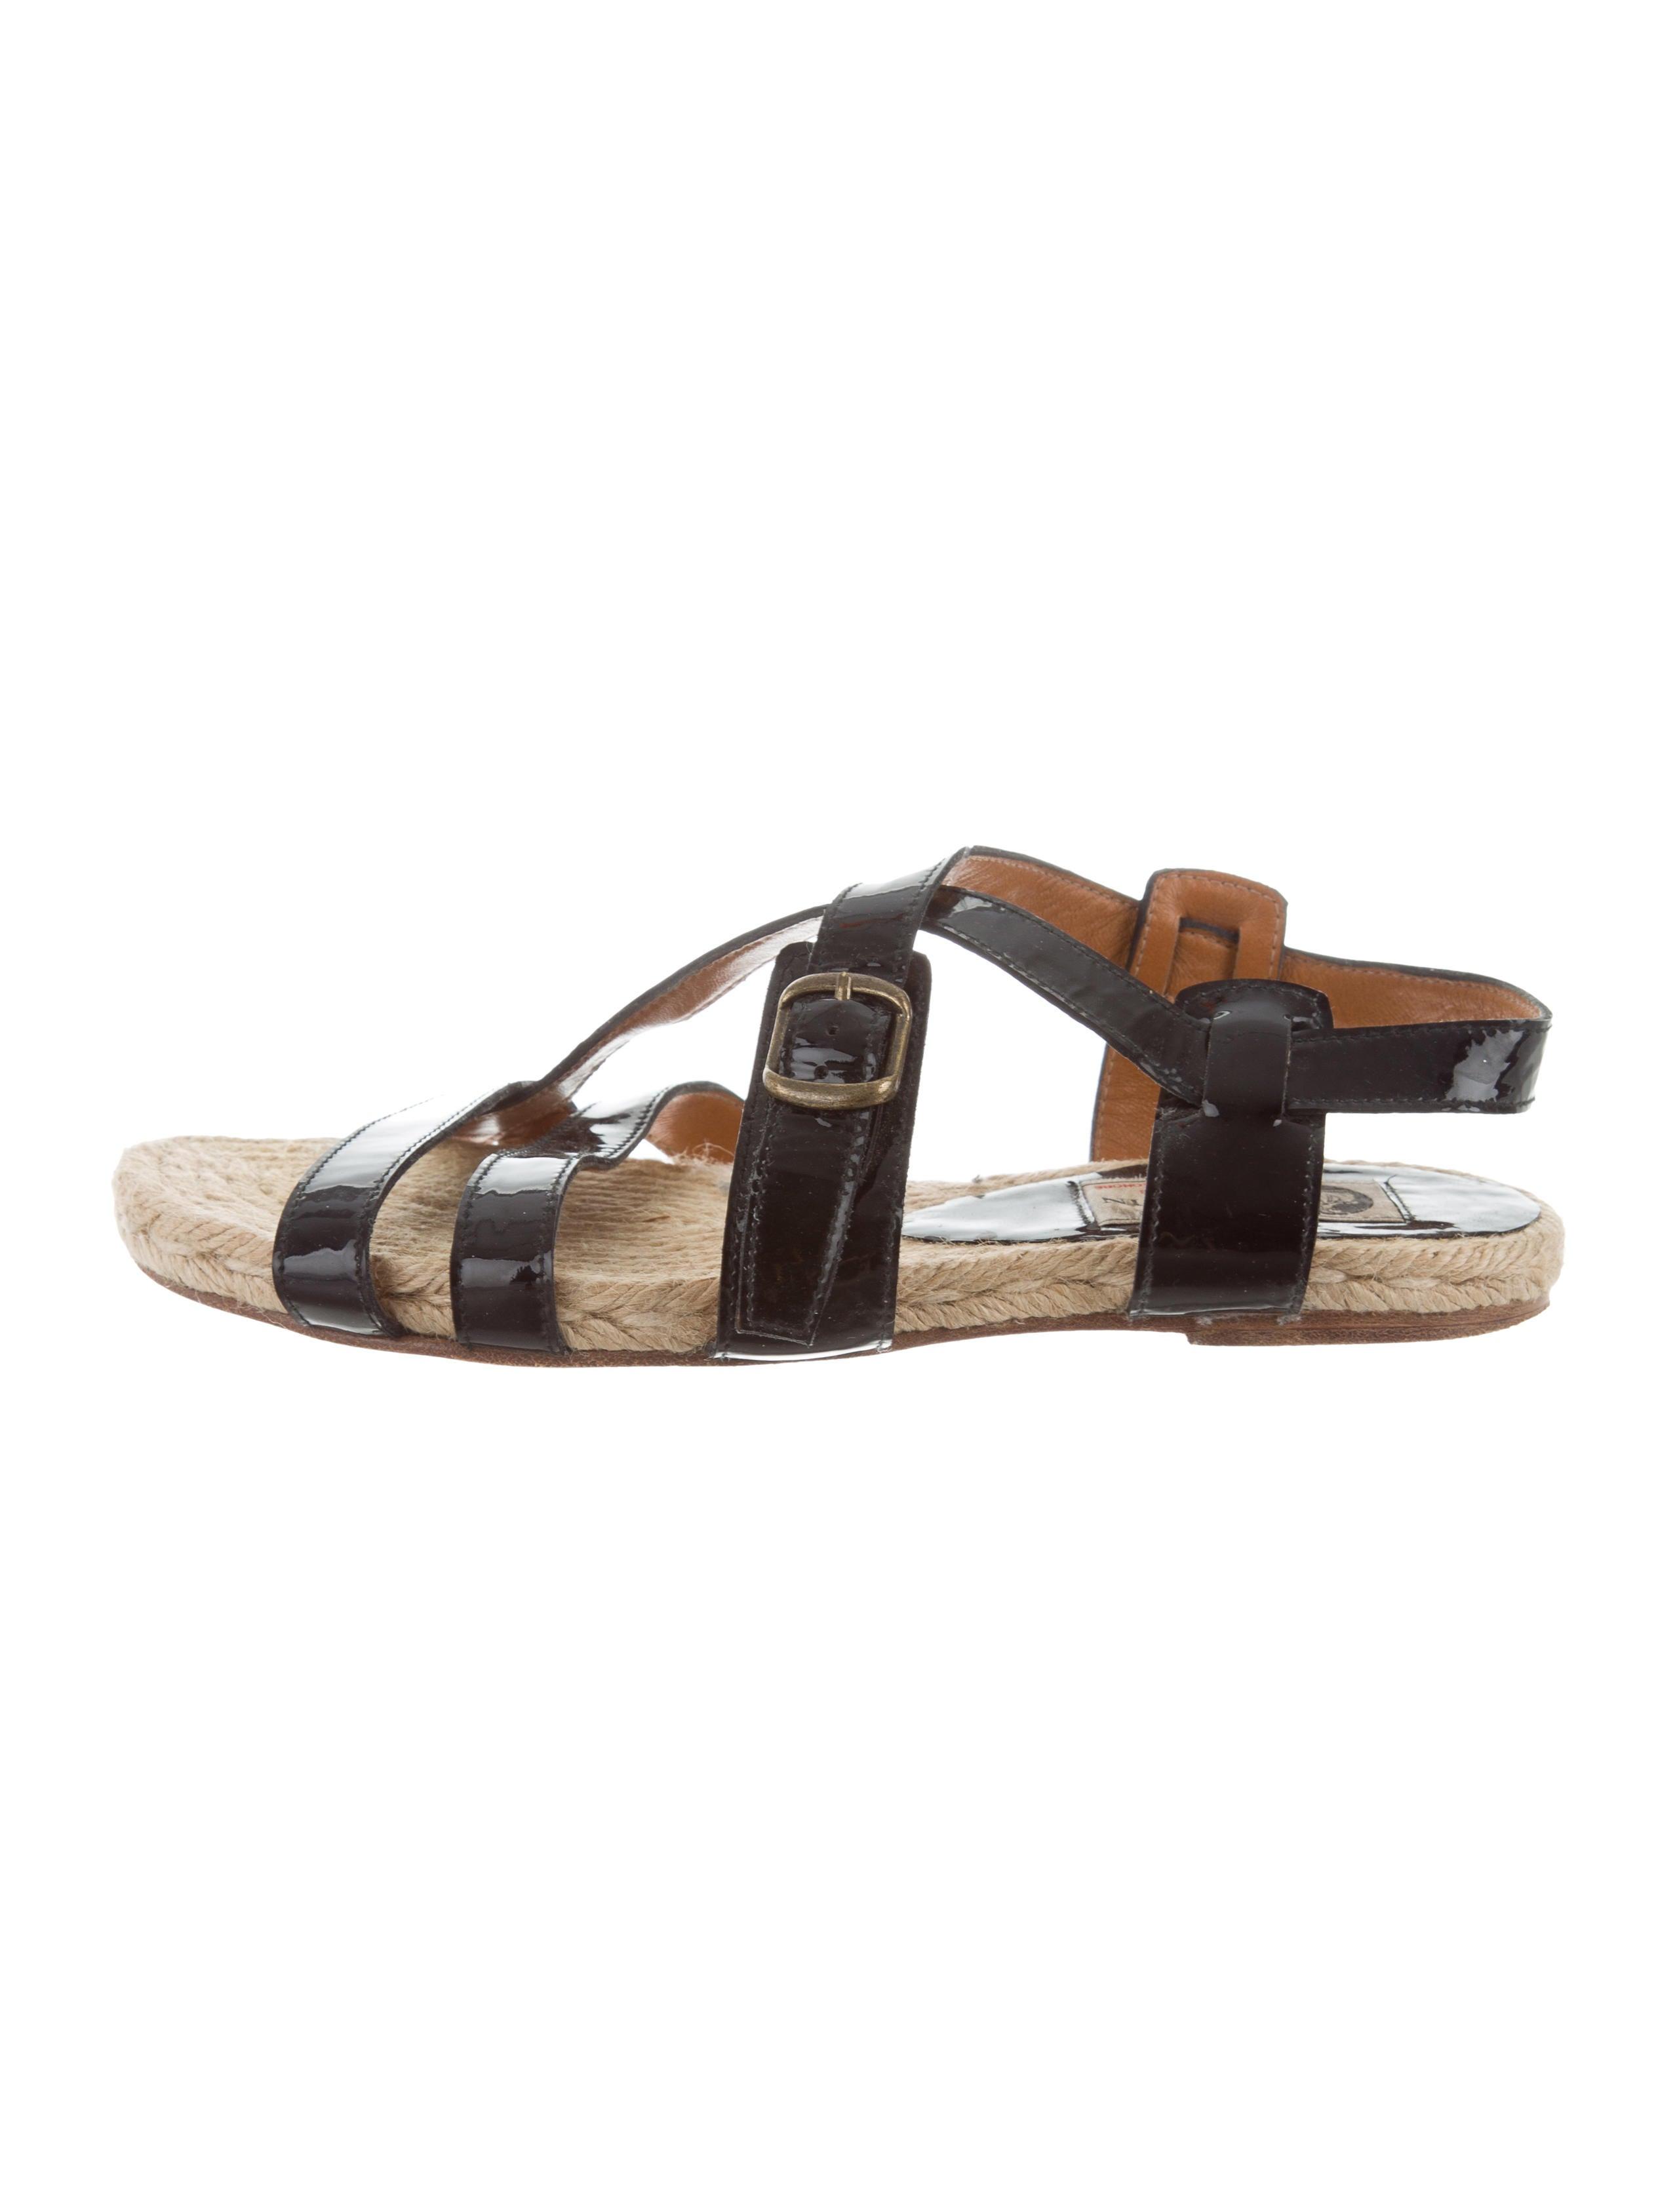 Lanvin Patent Leather Flip Flops 8gsfisA3